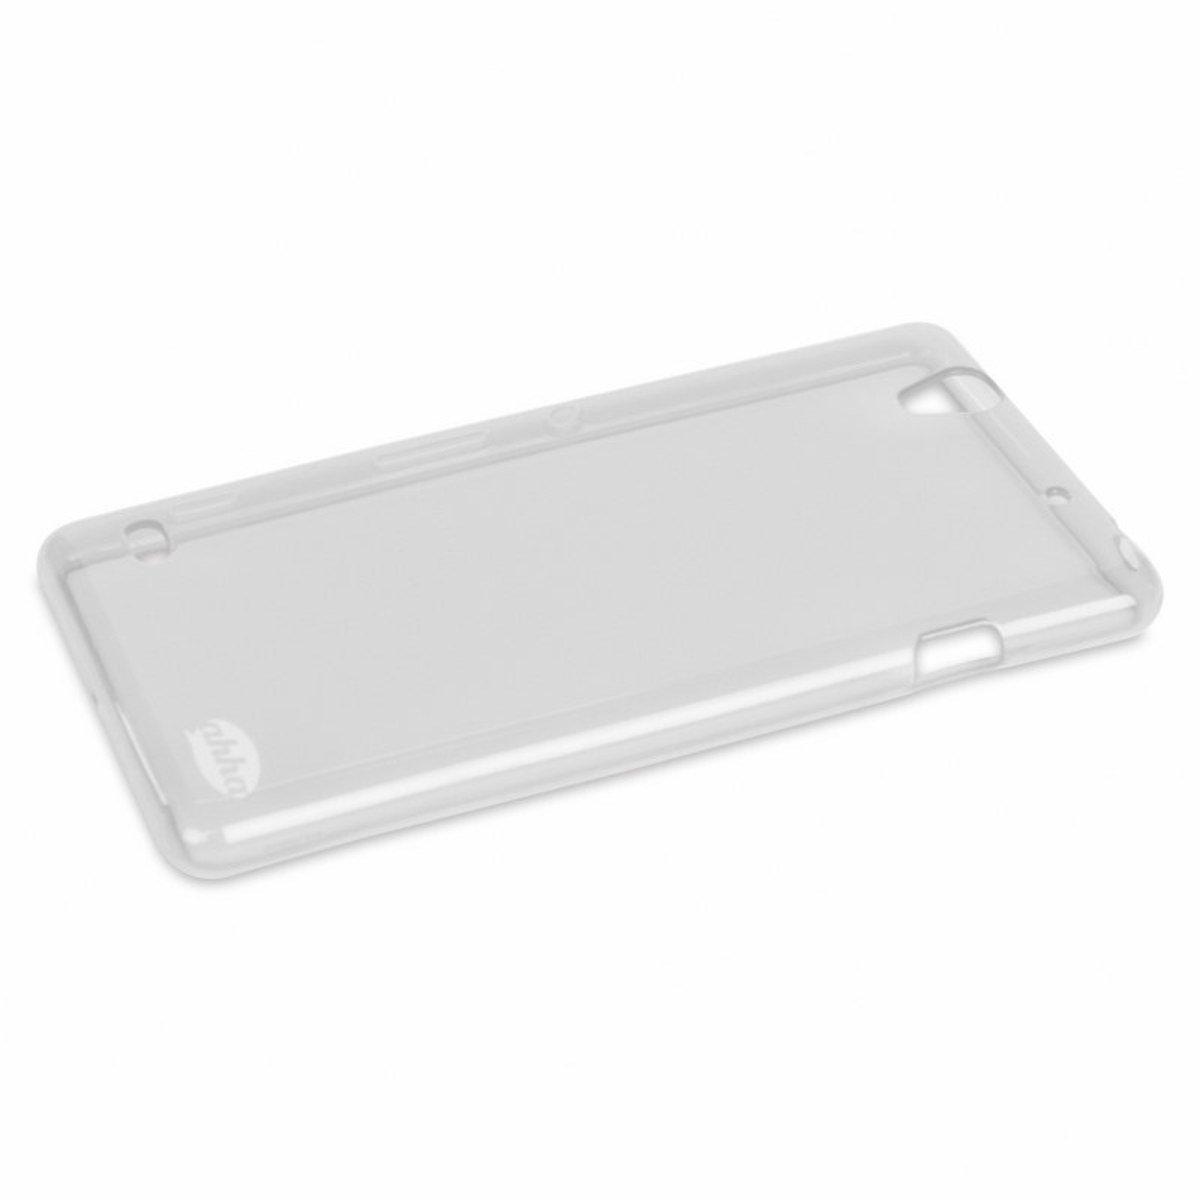 Sony Xperia C4 手機保護殼 GummiShell MOYA LITE (透明)